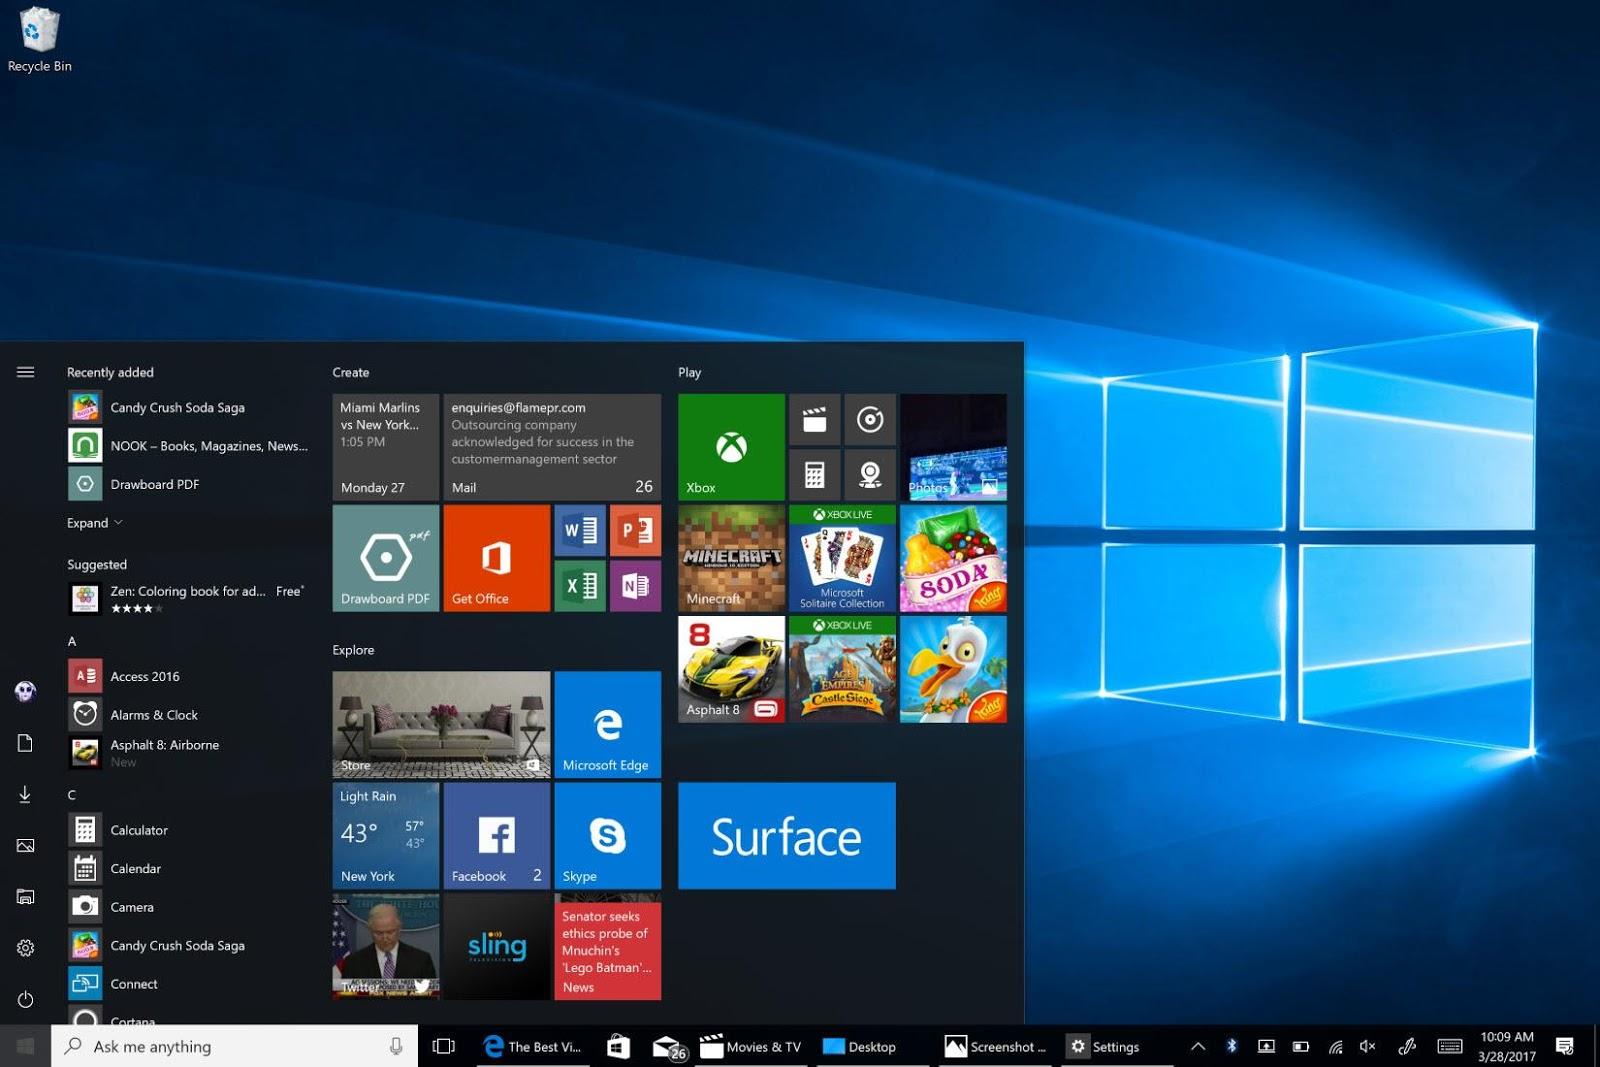 Windows 10 Start Screen to Increase Internet Speed